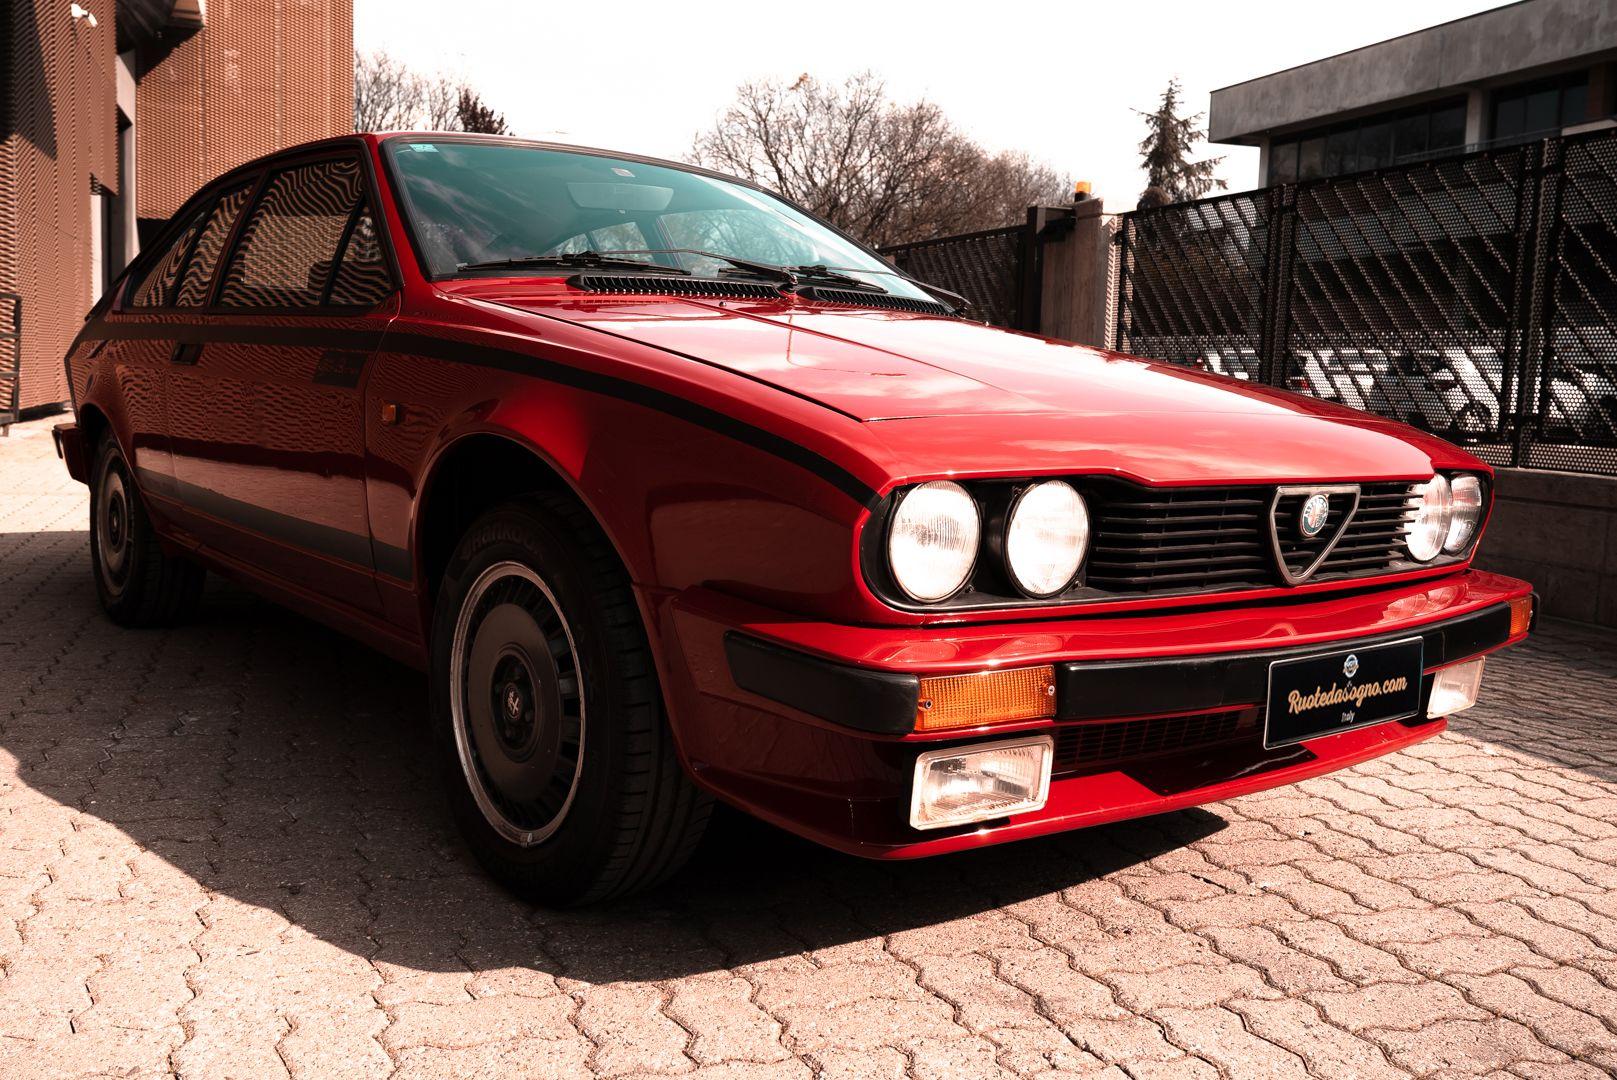 1981 Alfa Romeo Alfetta GTV Gran Prix n.128 68555